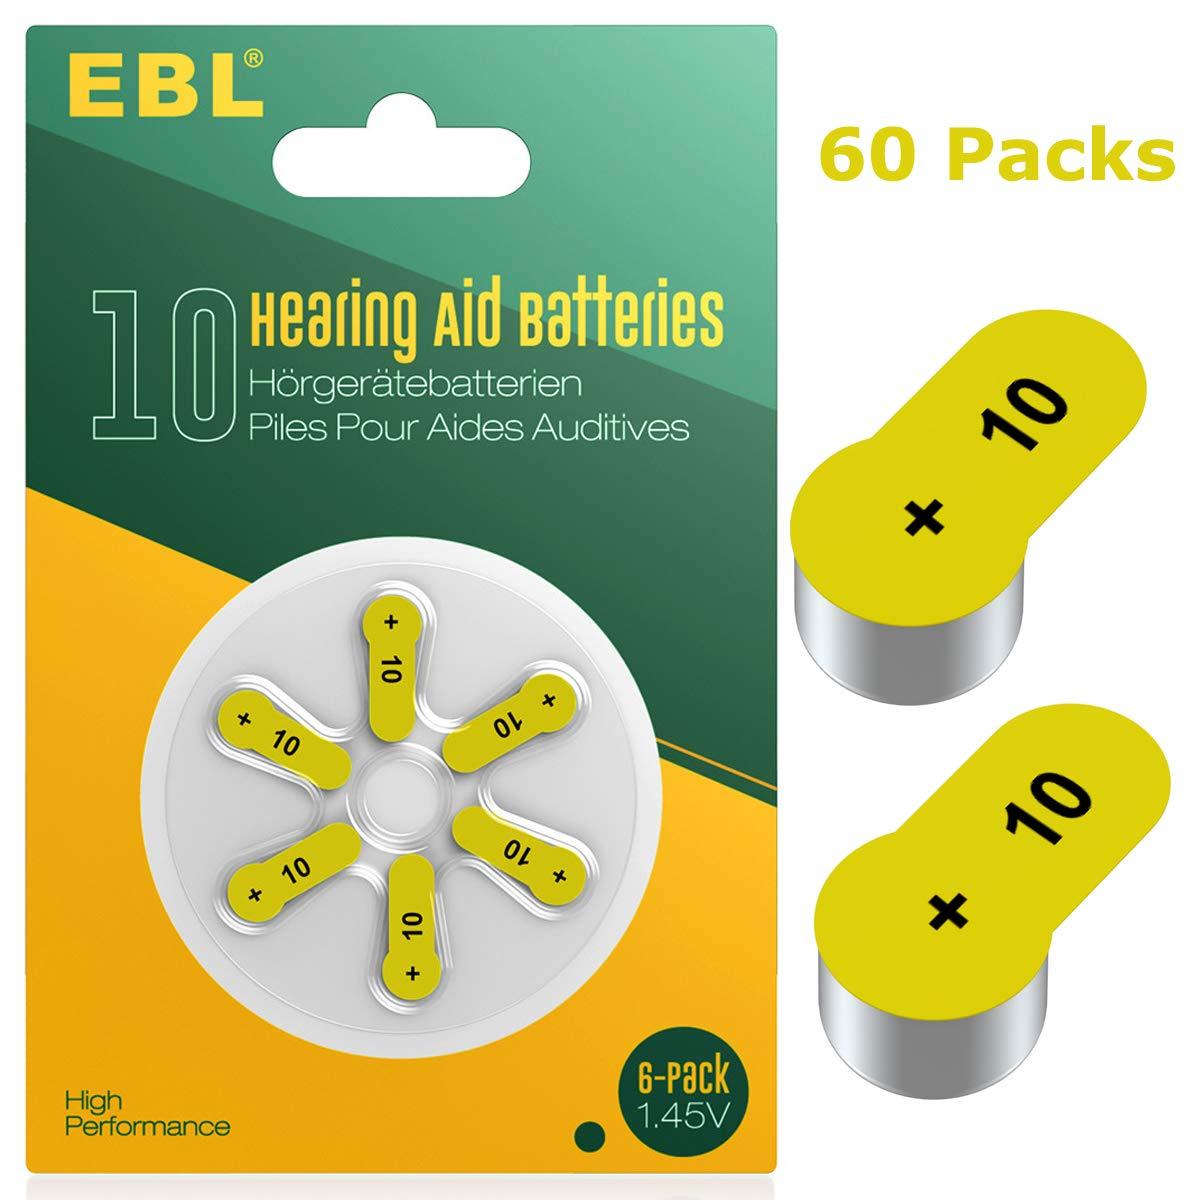 EBL Size 10 PR70 Hearing Aid Batteries 60 Pack 1.45V Zinc-Air Battery by EBL